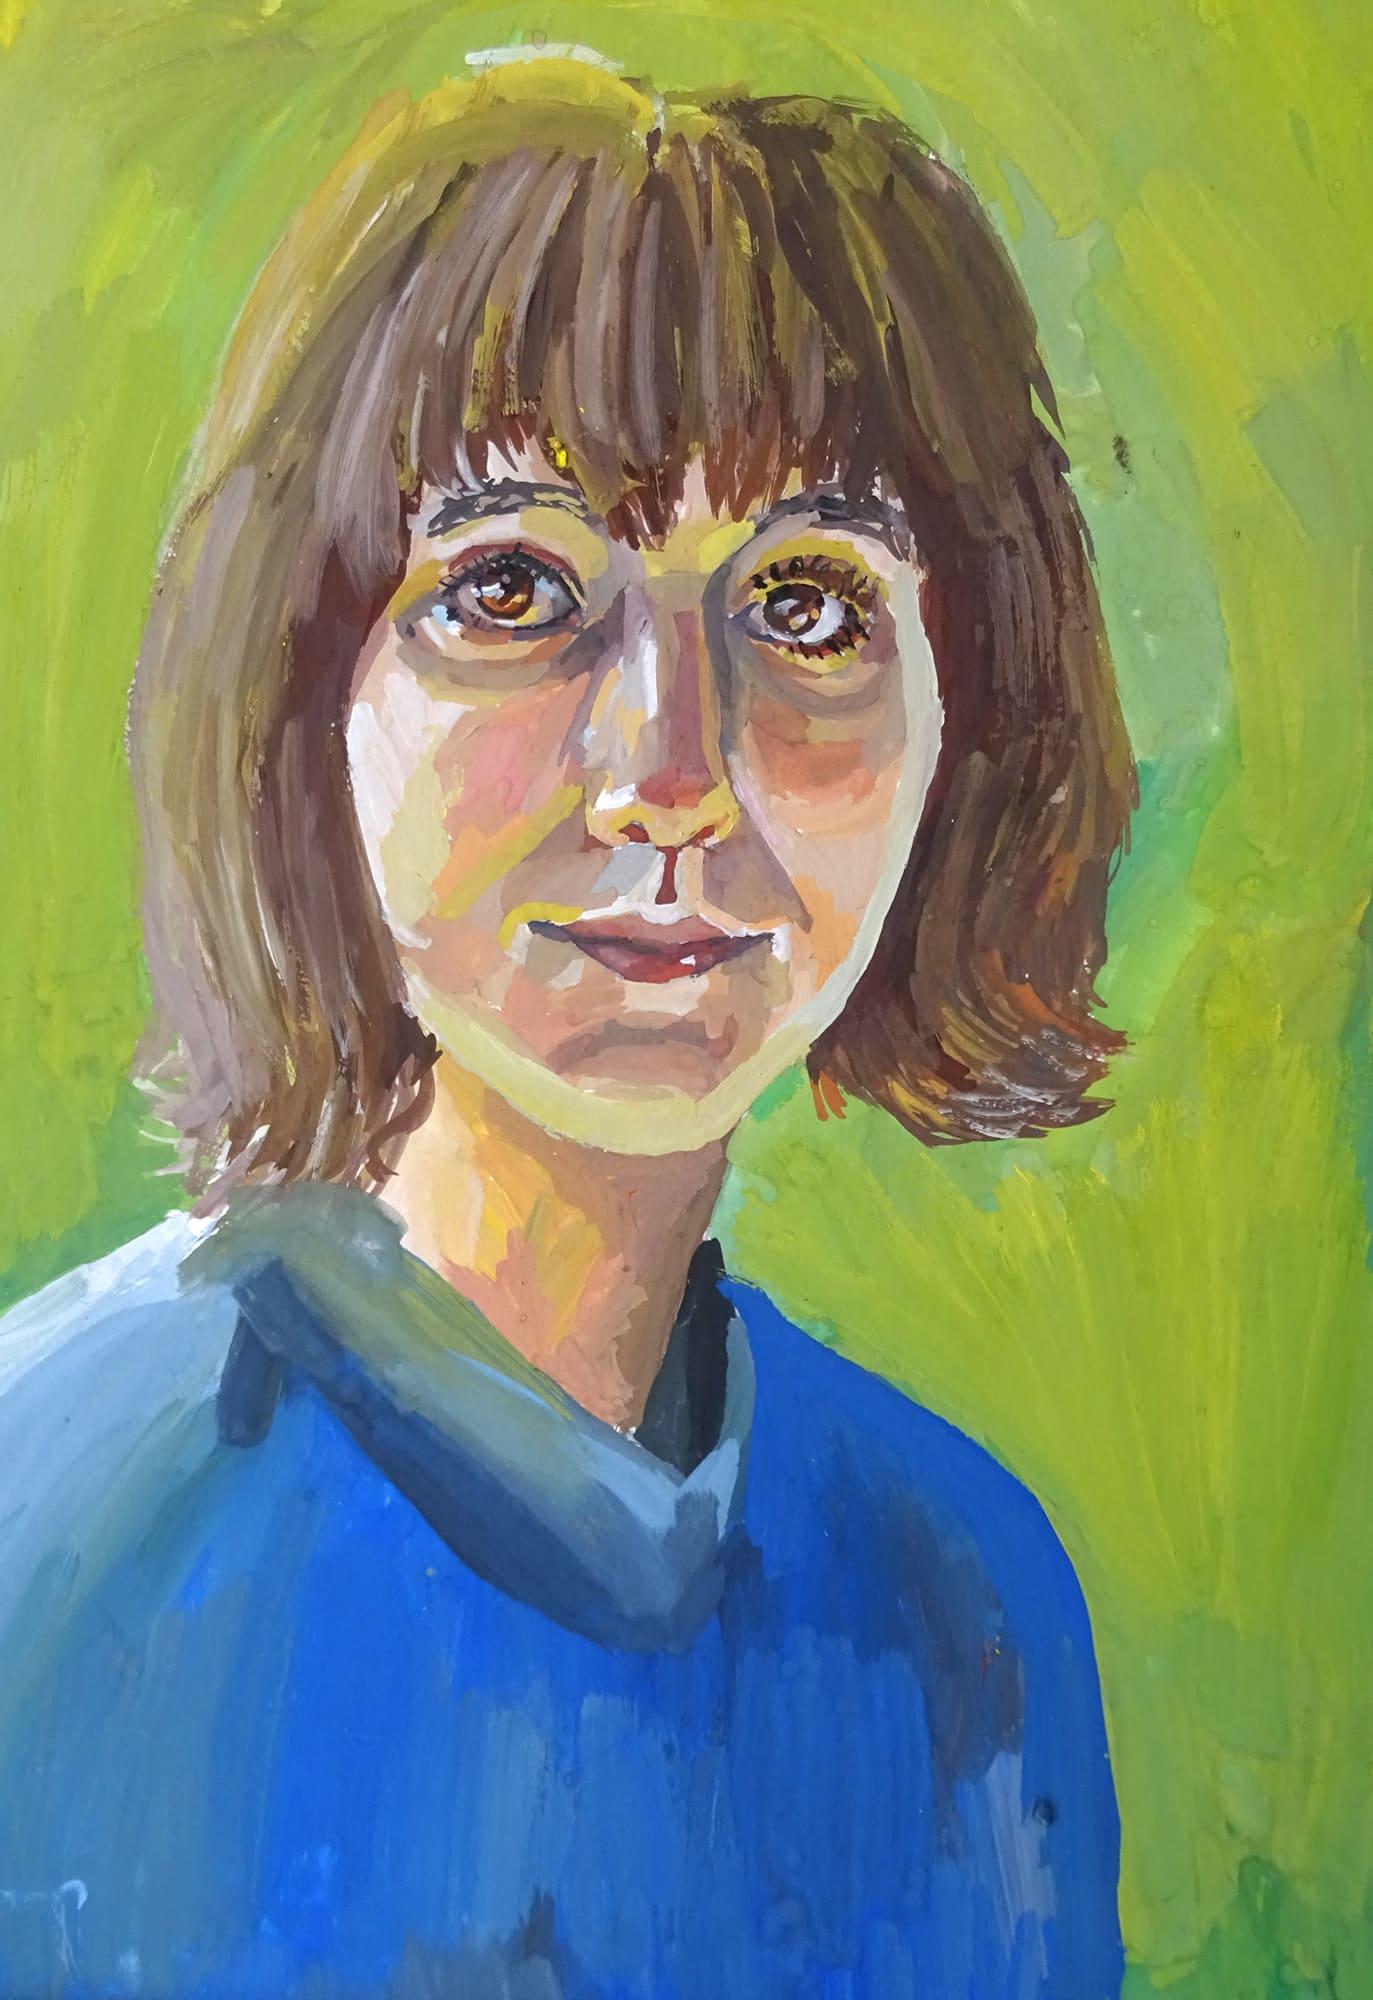 Антипина Дарья, 16 лет